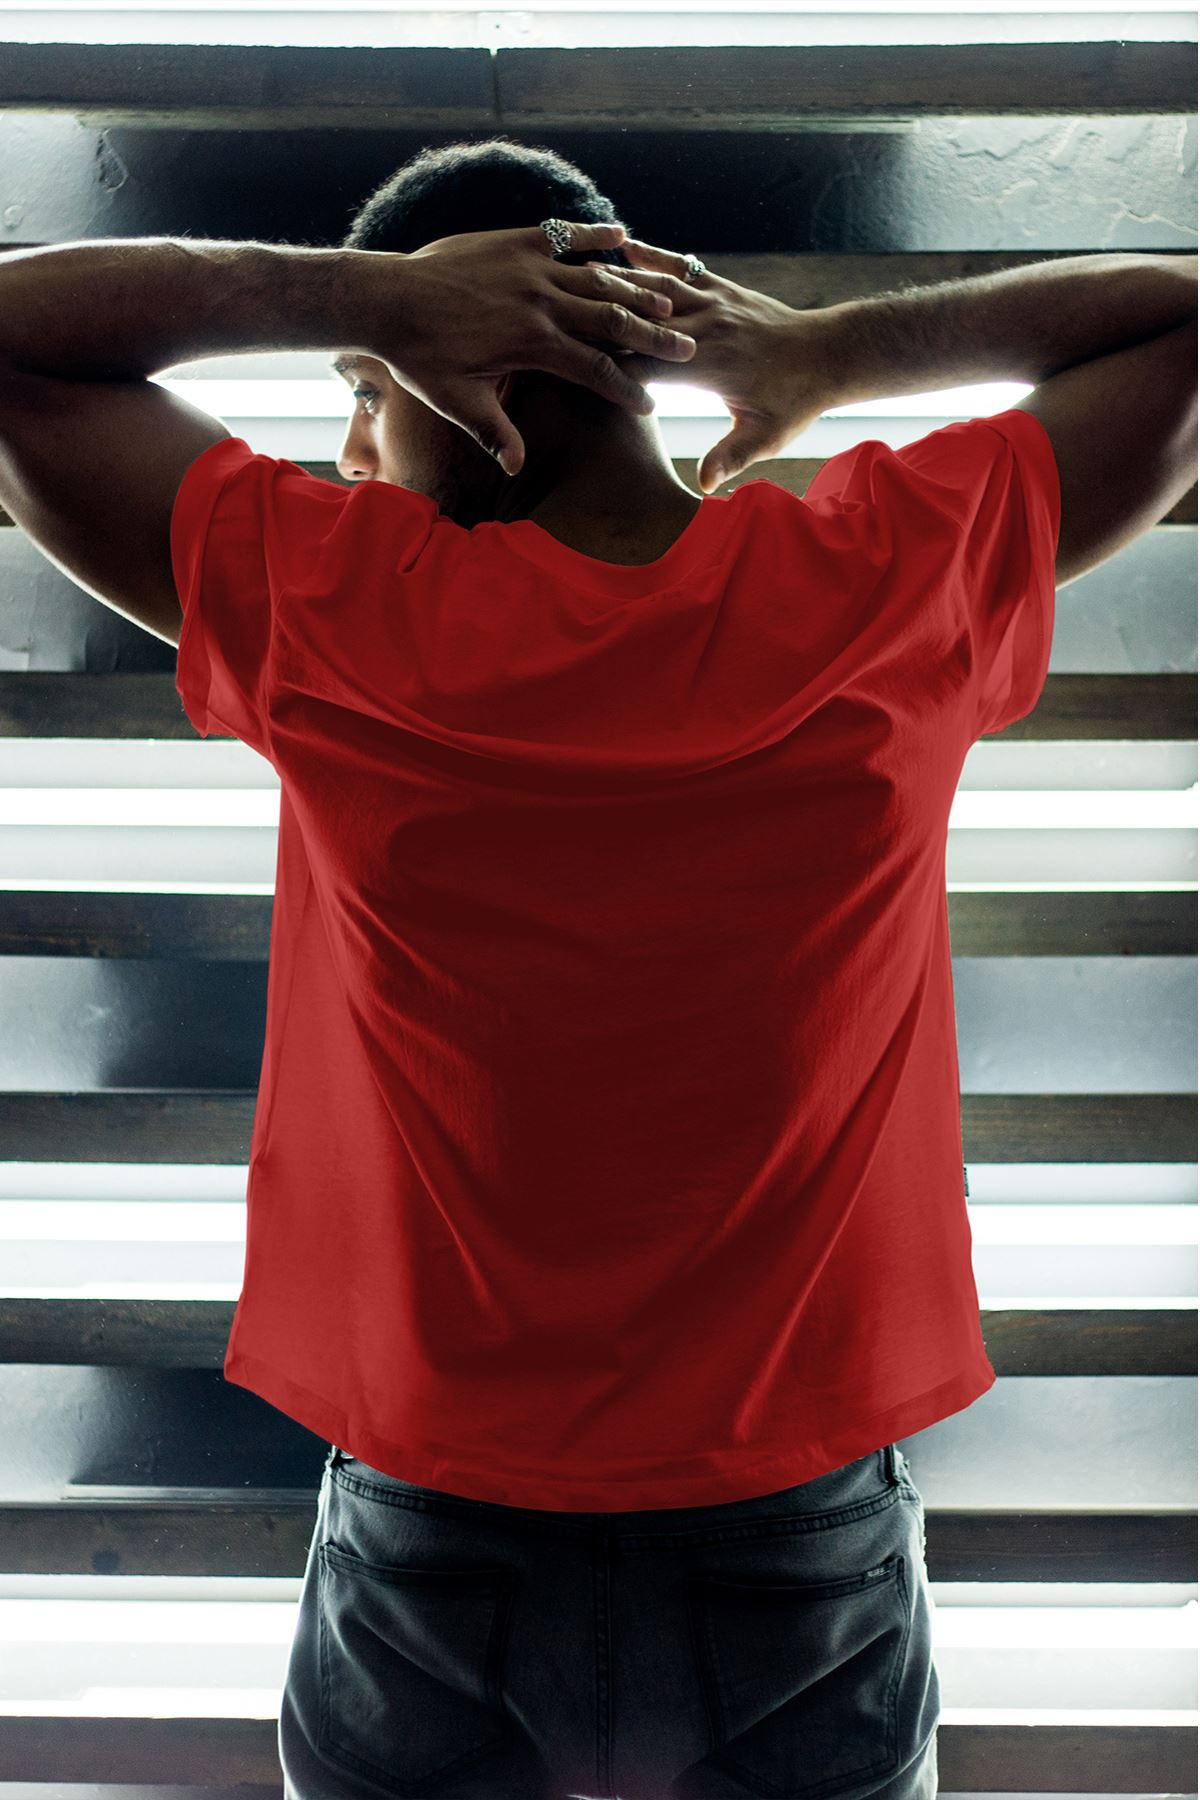 Free Rick Kırmızı Erkek Oversize Tshirt - Tişört